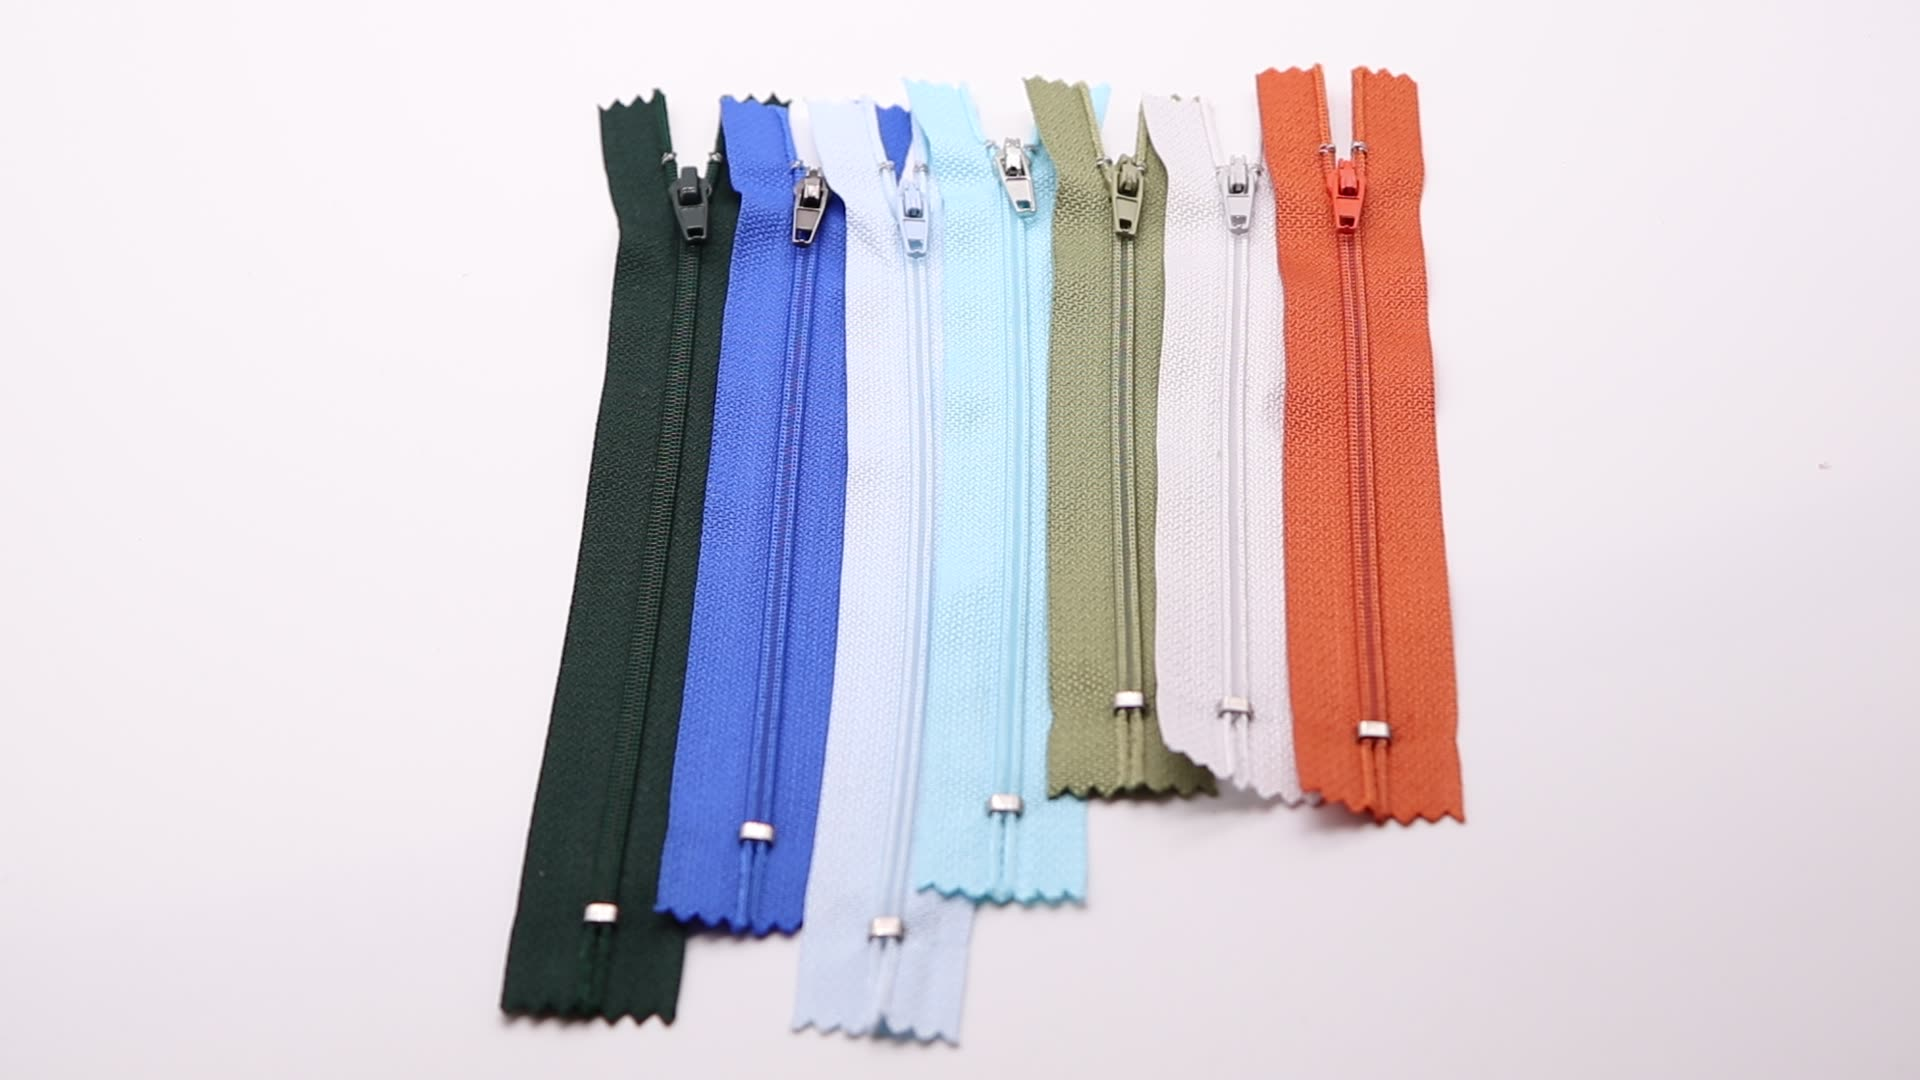 wholesale colorful bag zipper small zipper nylon zipper #3 for pants